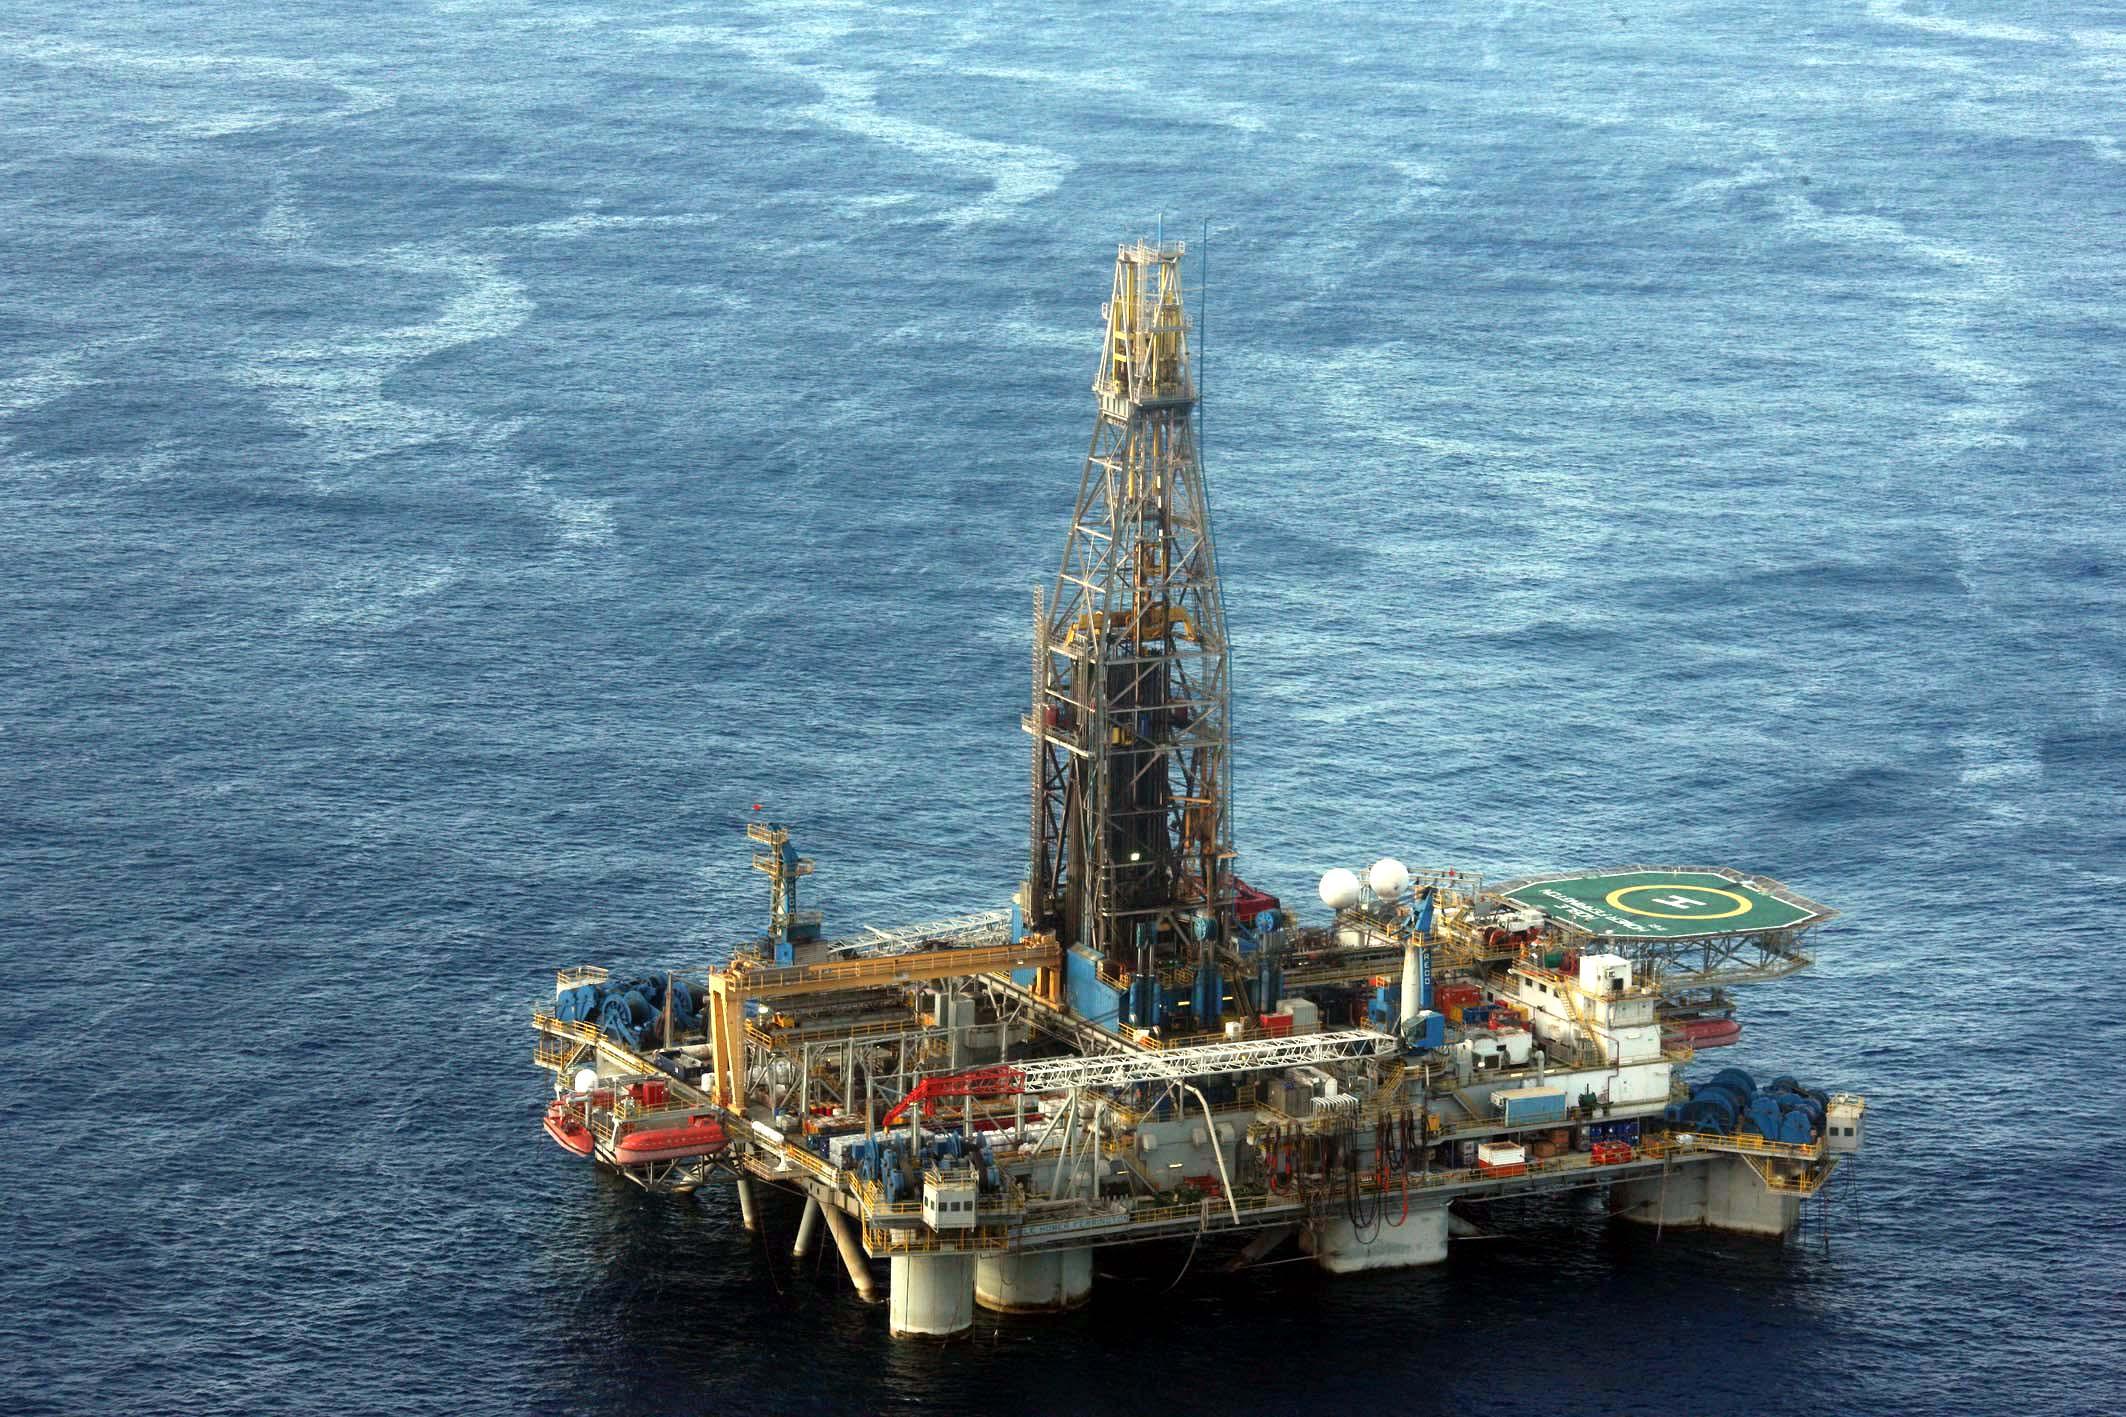 «Faz»: Τελευταία ελπίδα της Κύπρου το φυσικό αέριο | tovima.gr